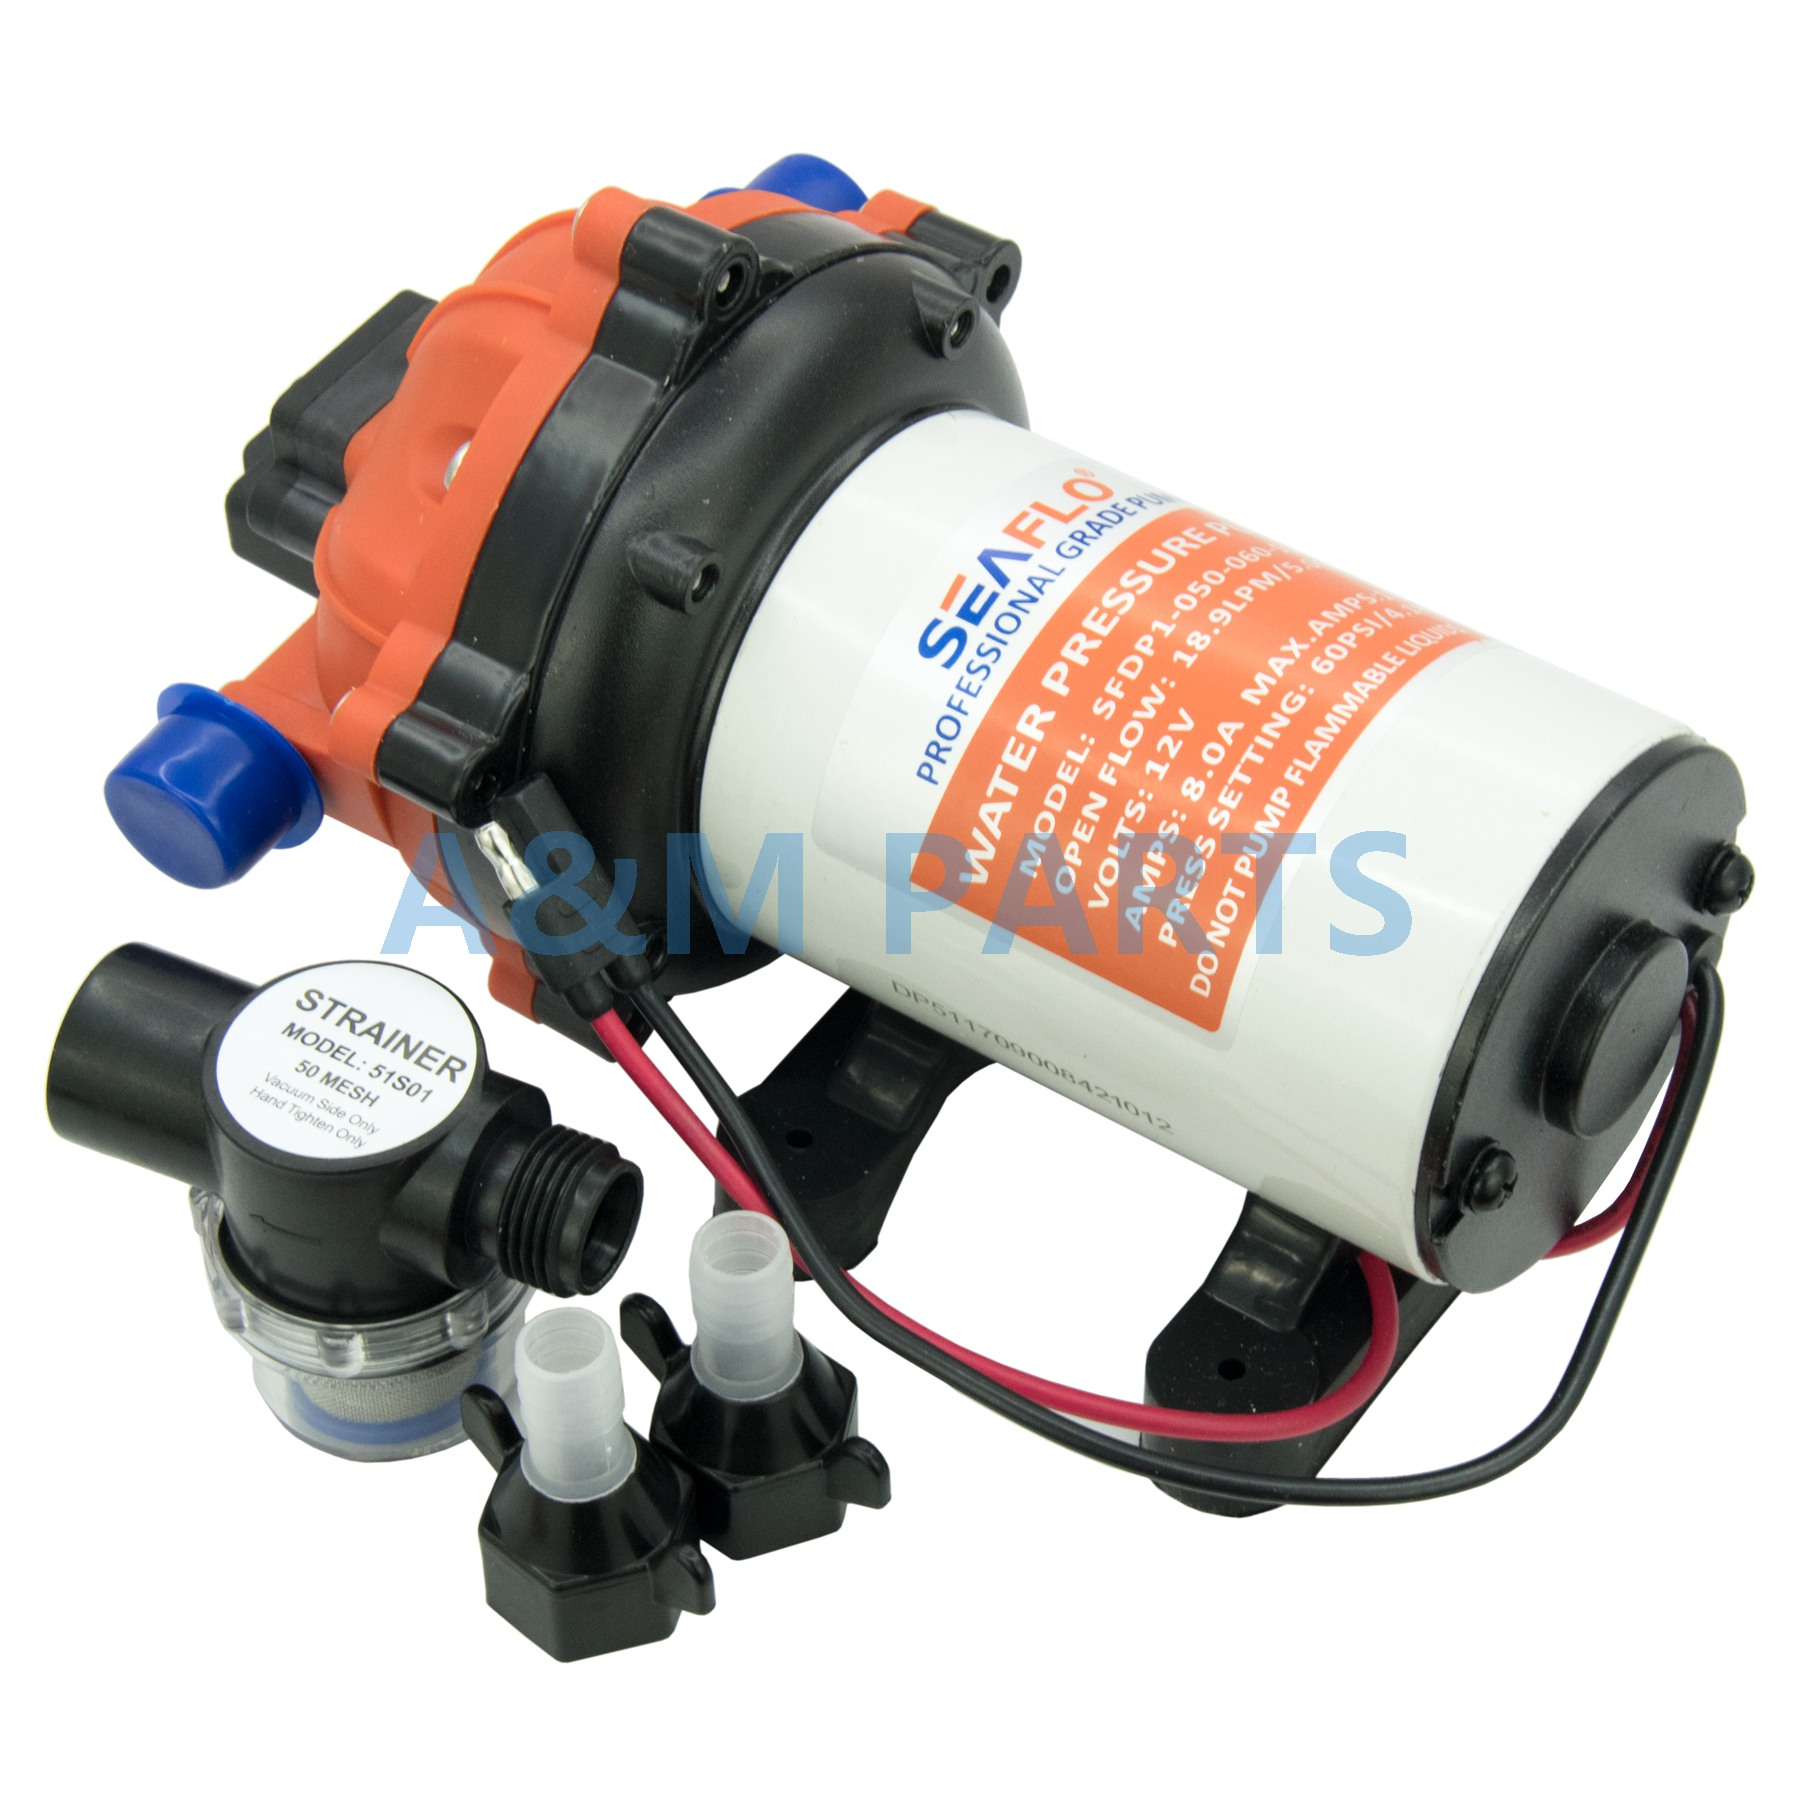 12V 60 PSI 5 0 GPM Self Priming Diaphragm Pump Boat Marine RV Water Pump